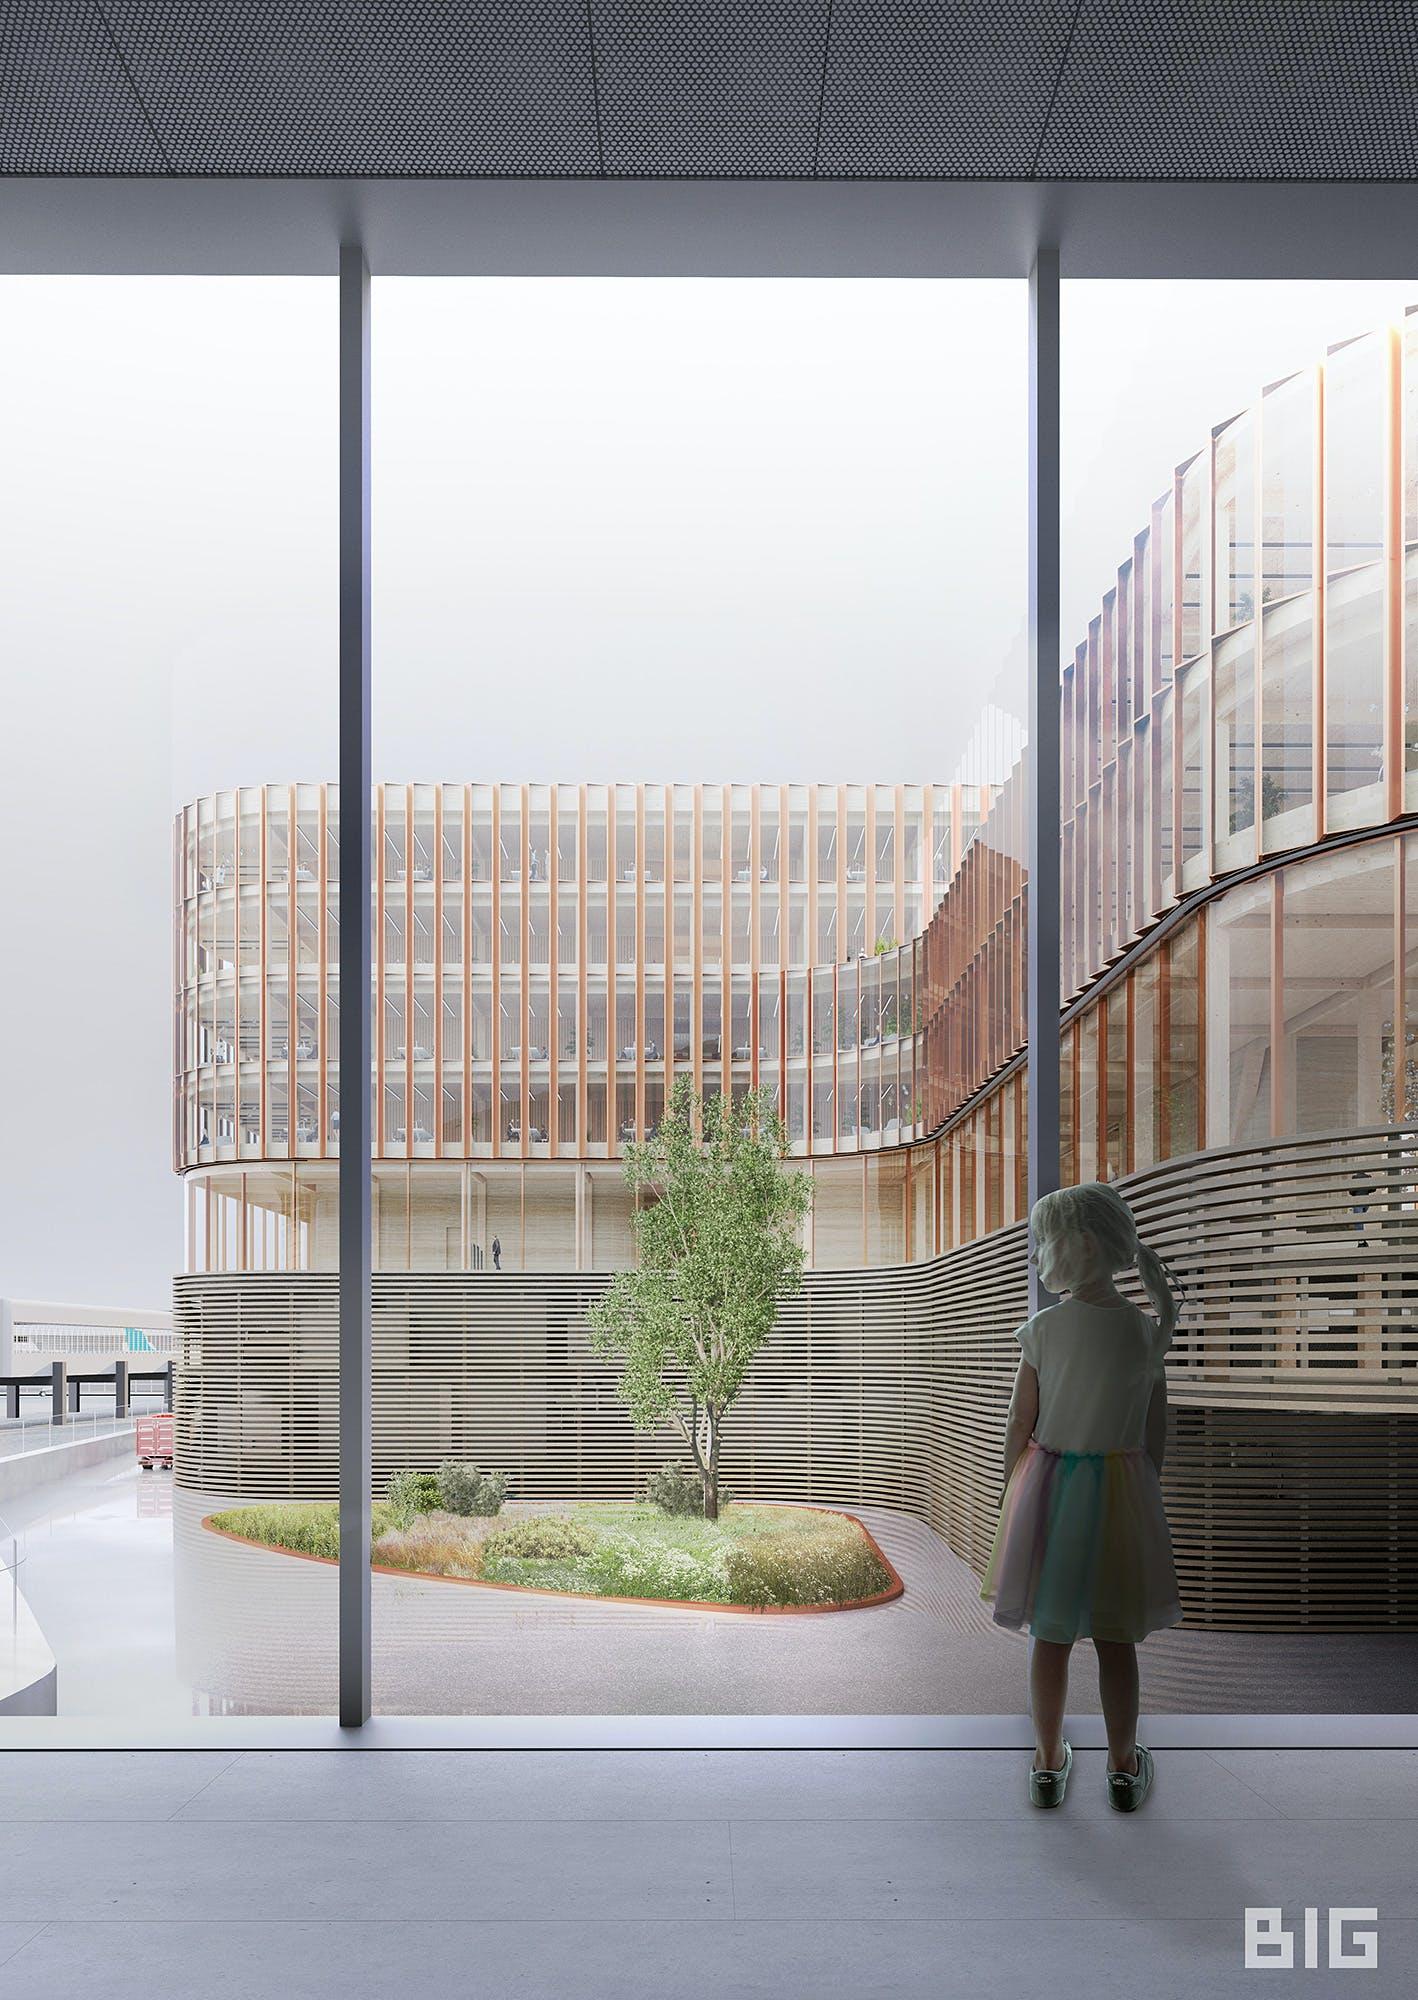 Big Amp Metaform Design A Wooden Office Building At